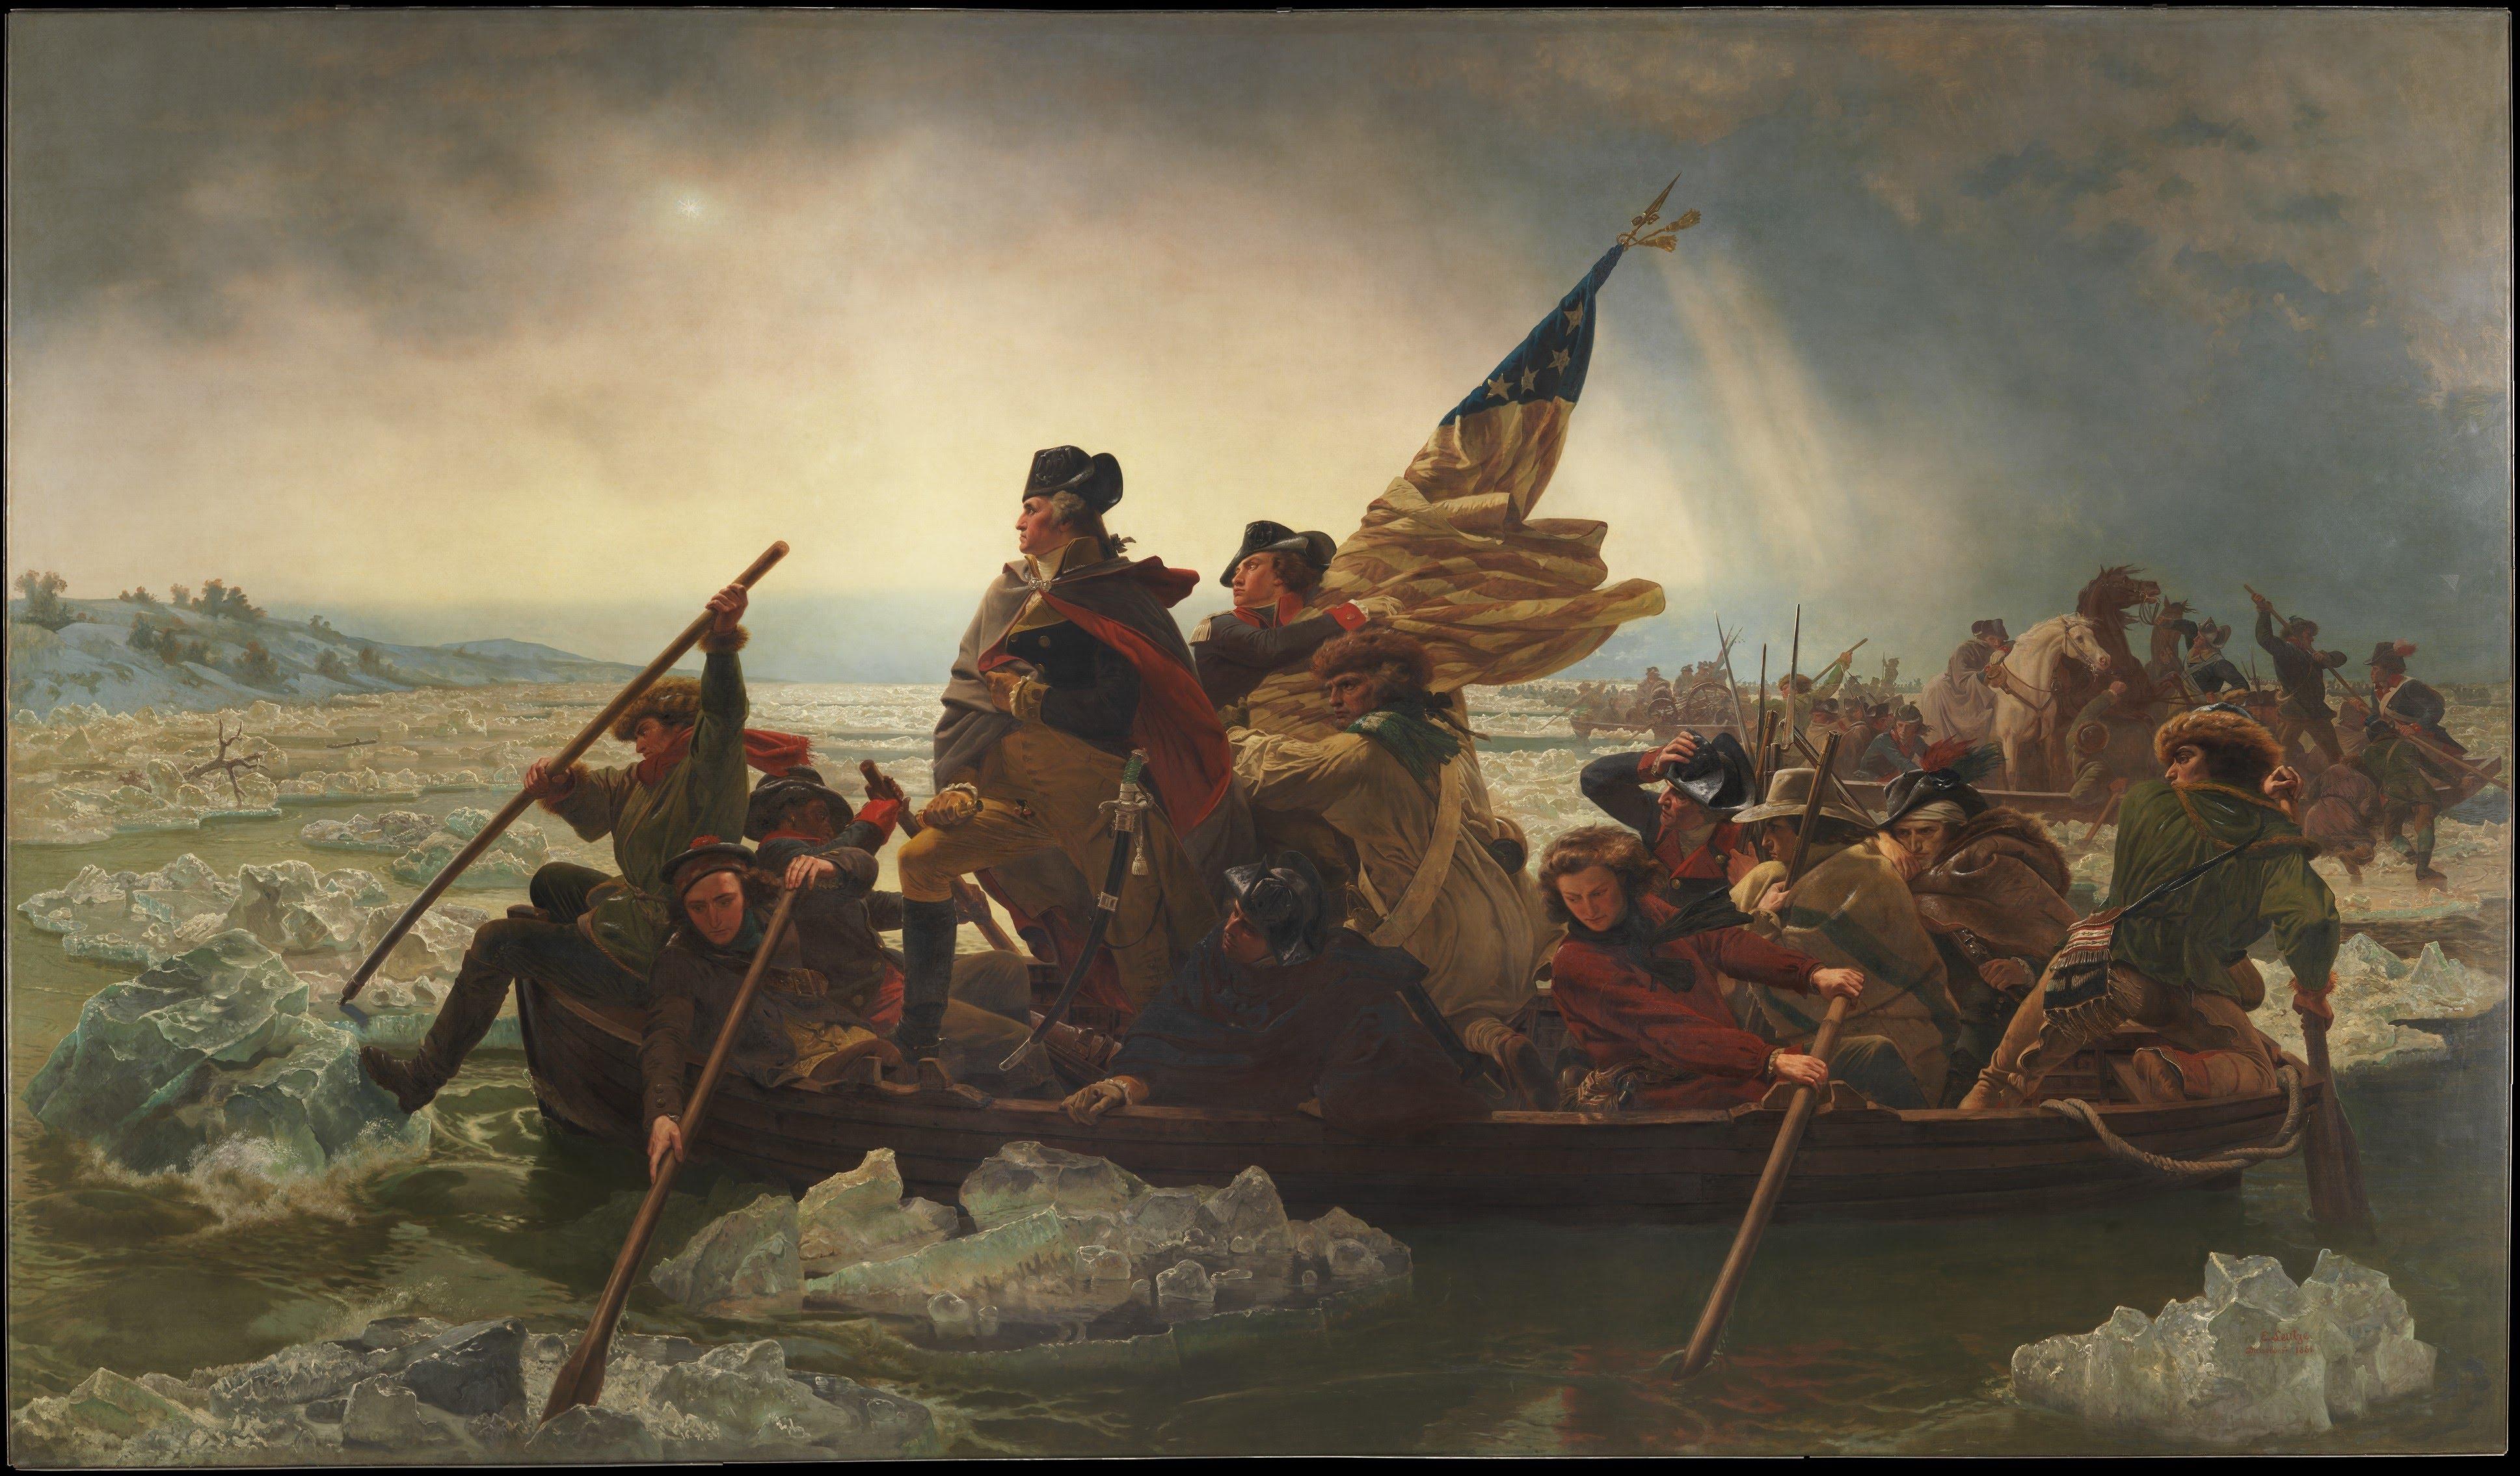 Washington Crossing the Delaware, December 25, 1776, by Emanuel Leutze, 1851